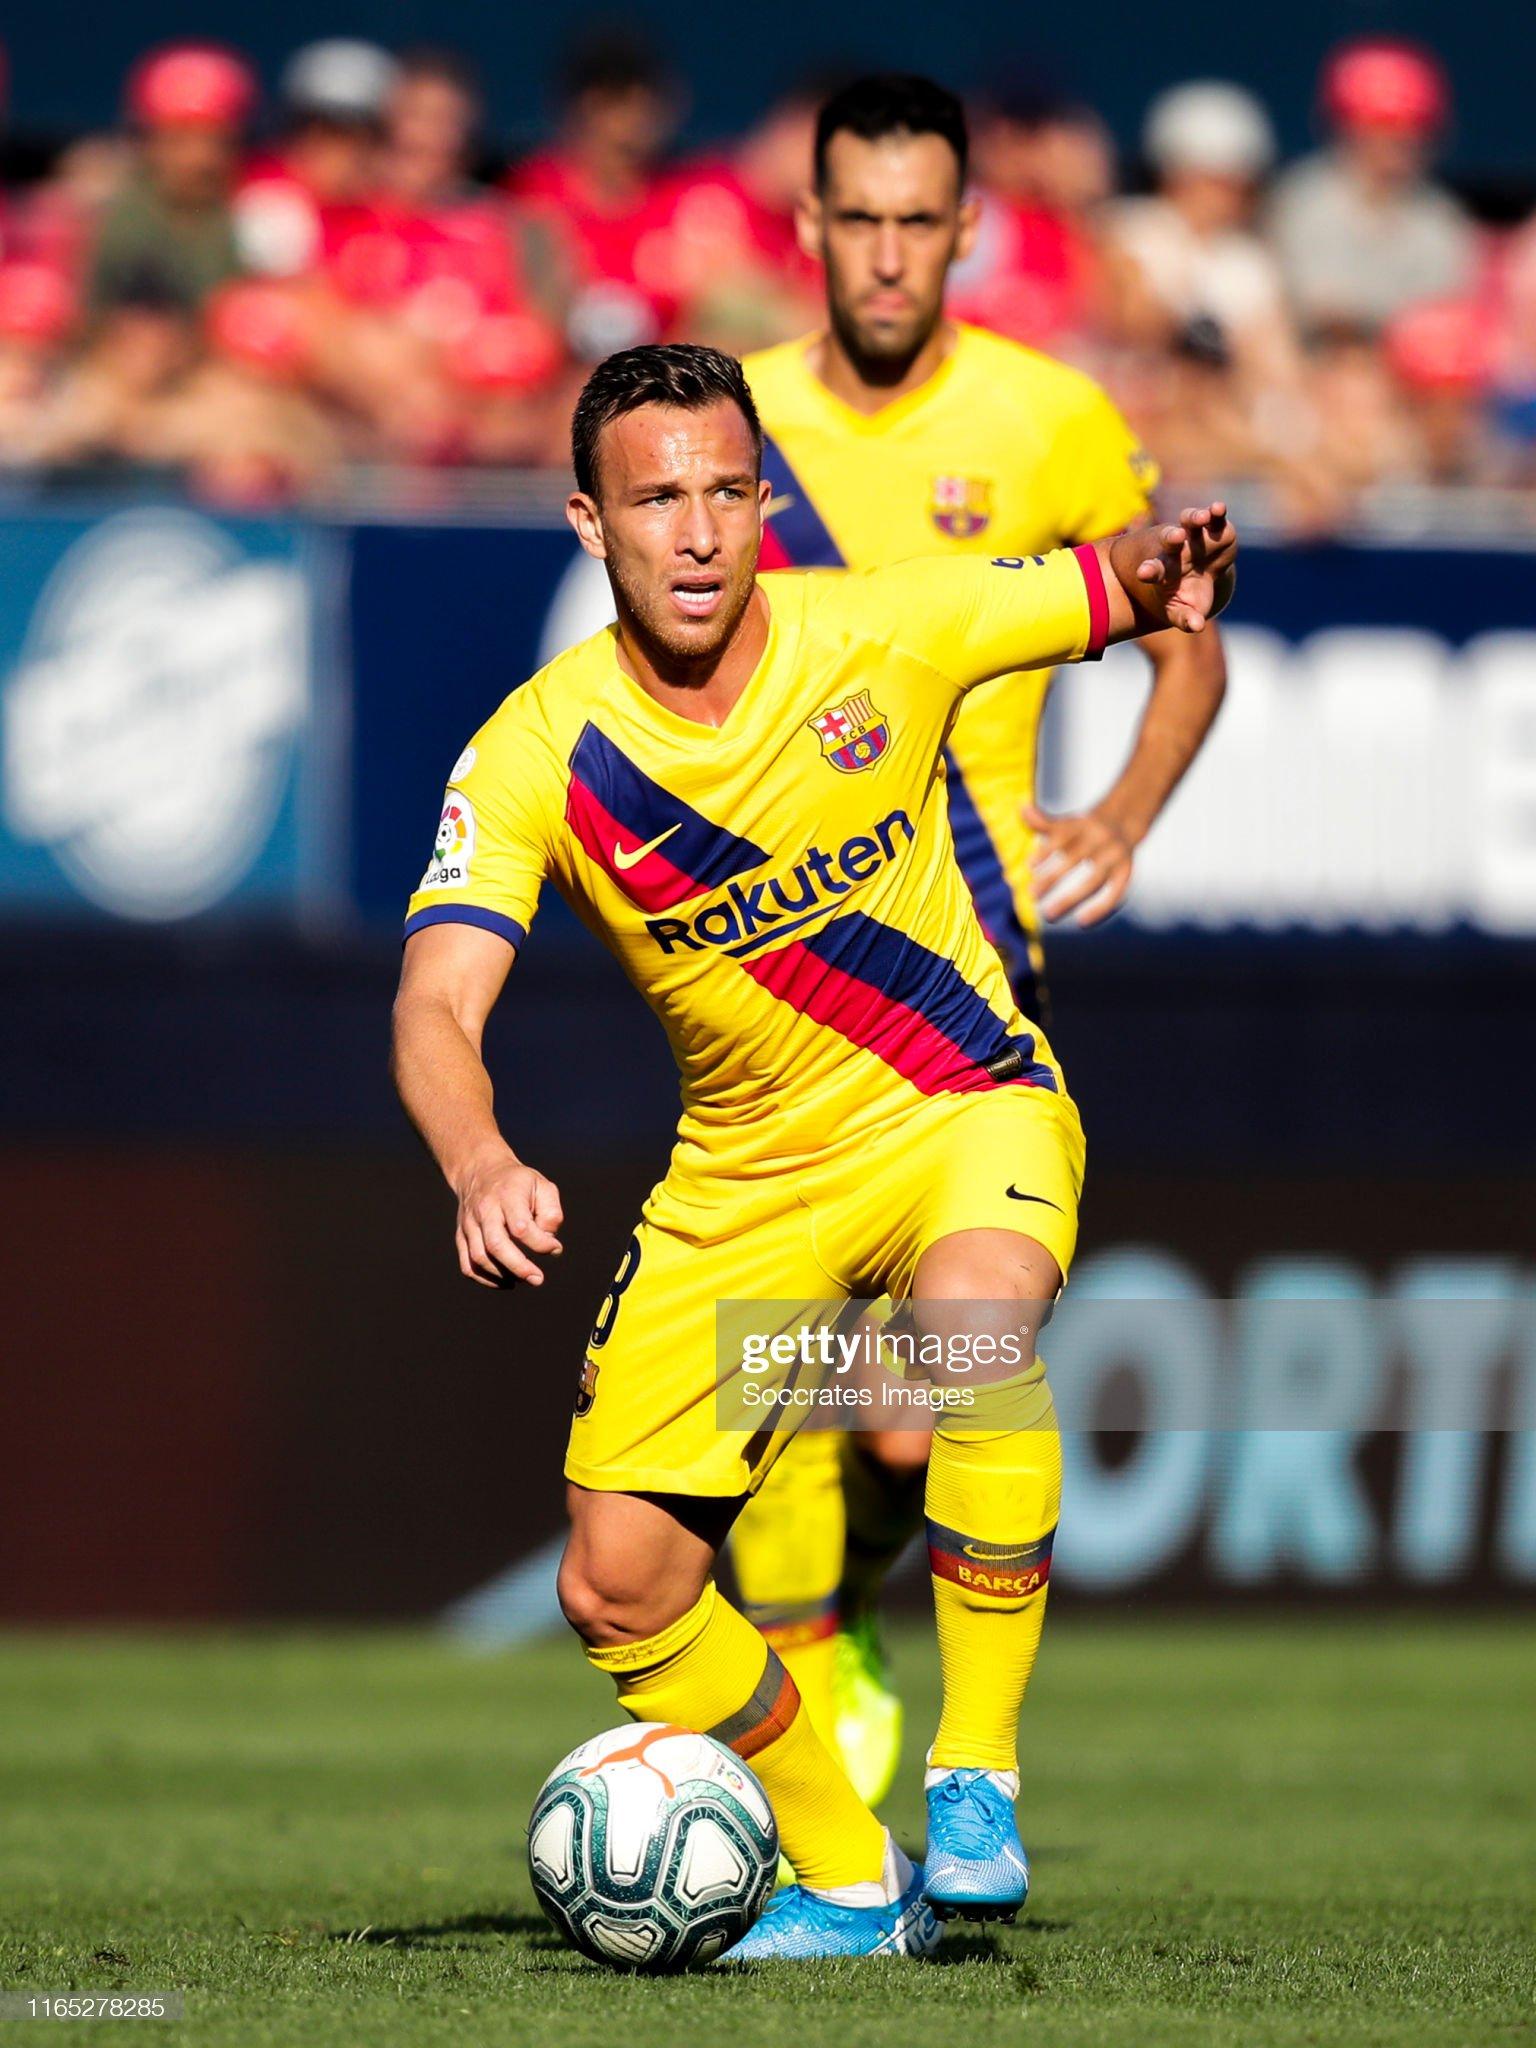 صور مباراة : أوساسونا - برشلونة 2-2 ( 31-08-2019 )  Arthur-of-fc-barcelona-during-the-la-liga-santander-match-between-v-picture-id1165278285?s=2048x2048